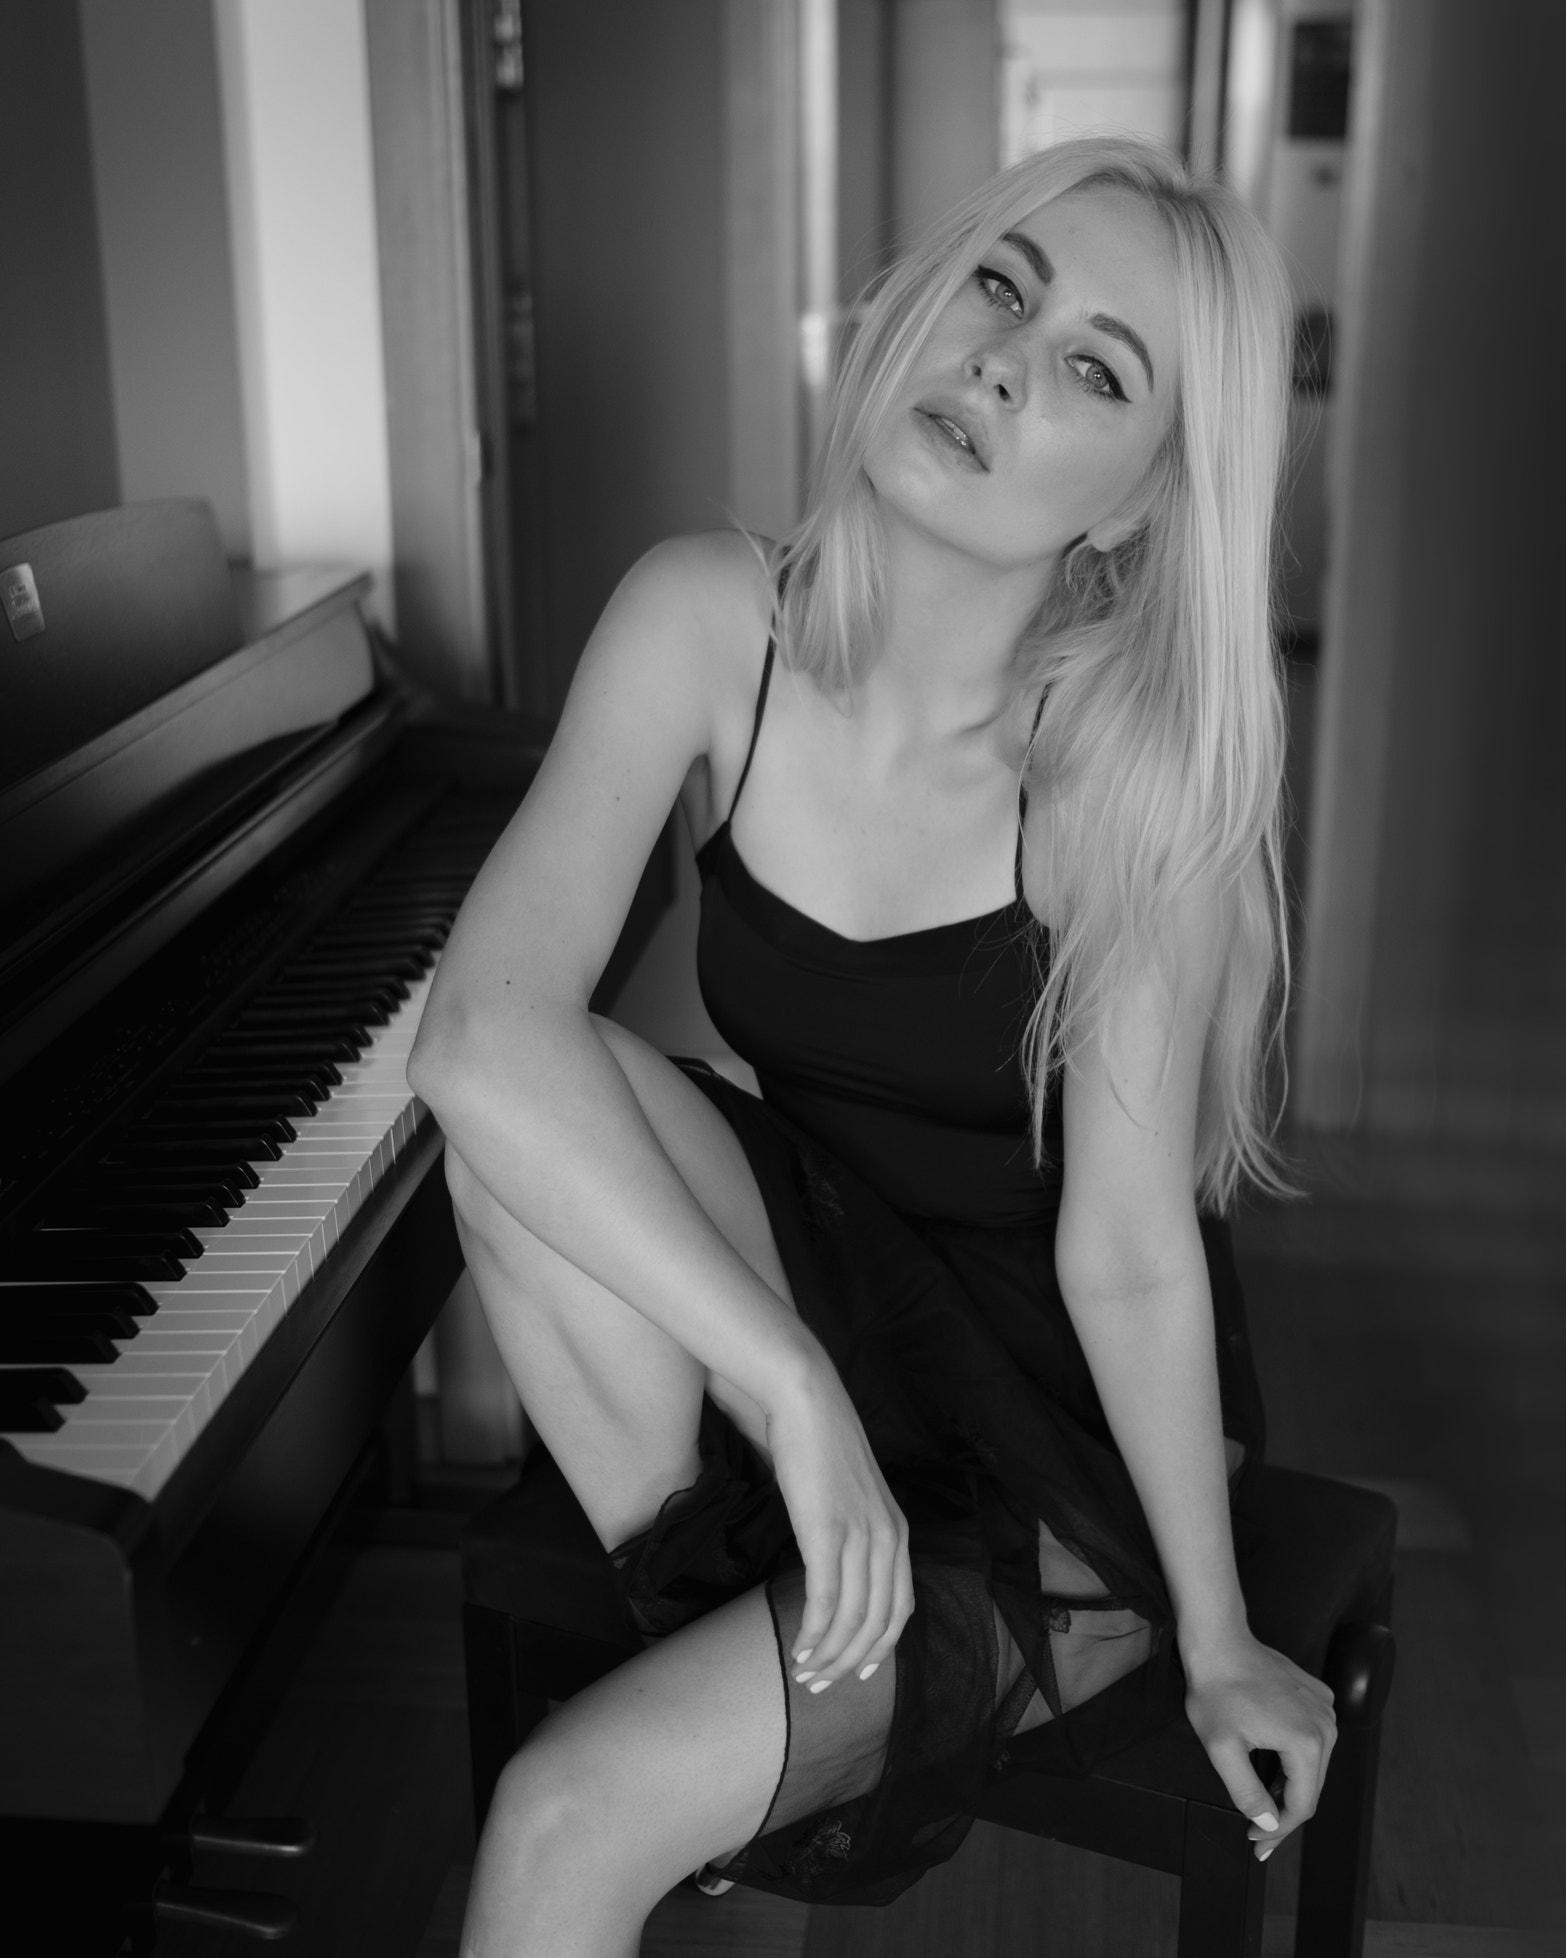 Wallpaper Monochrome Women Piano Musical Instrument Portrait 500px David Mas 1566x1958 Wallpapermaniac 1486879 Hd Wallpapers Wallhere